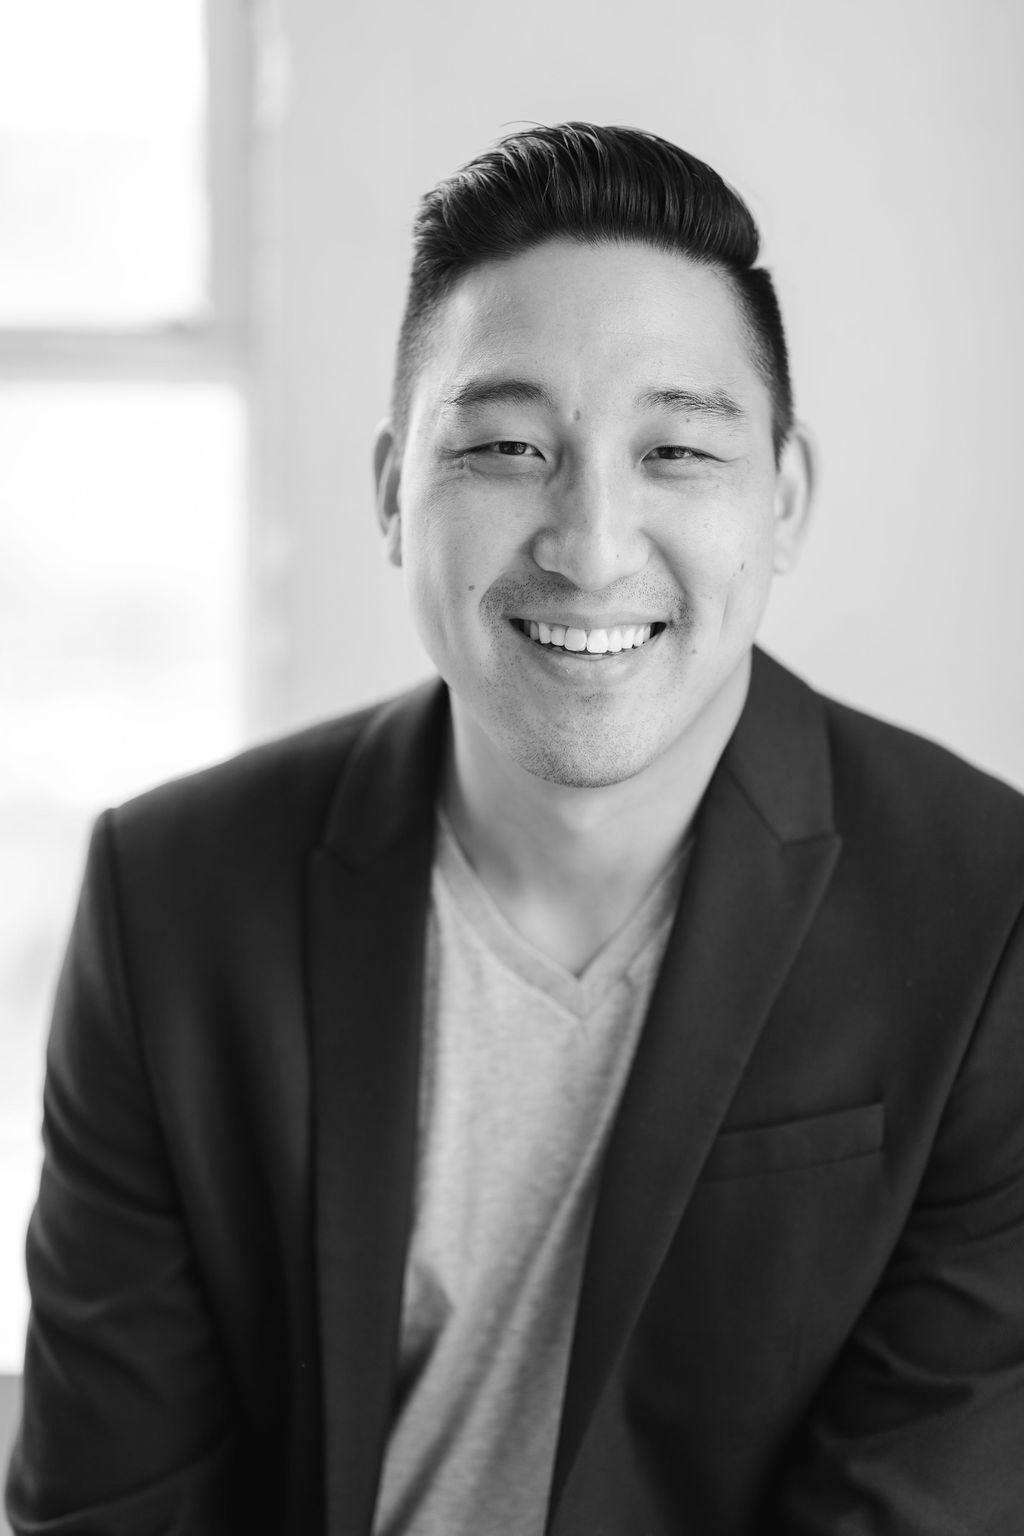 Edison Lee